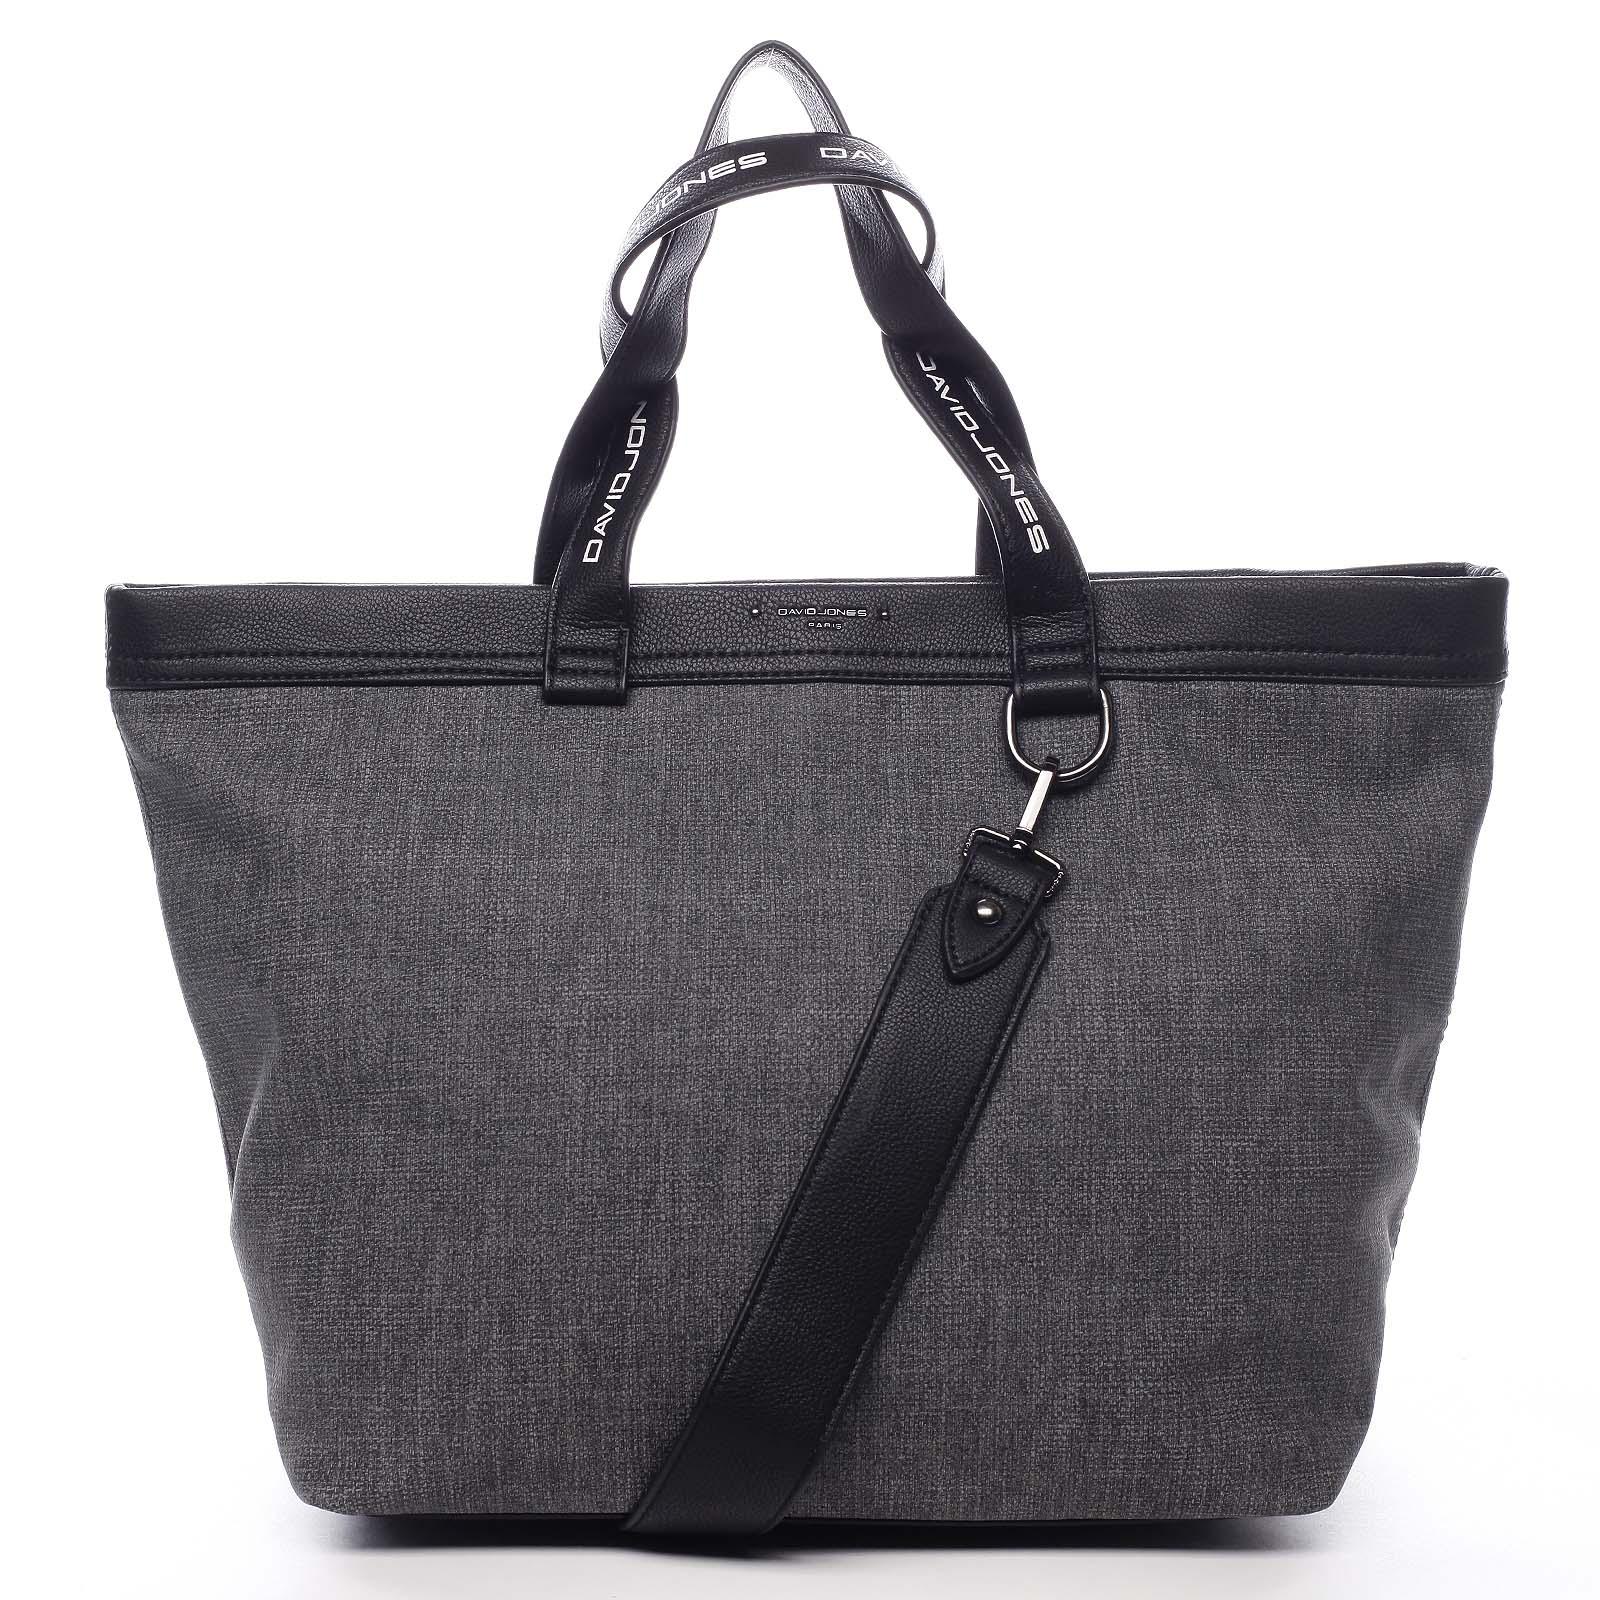 Veľká dámska kabelka antracitová - David Jones Graciete čierna